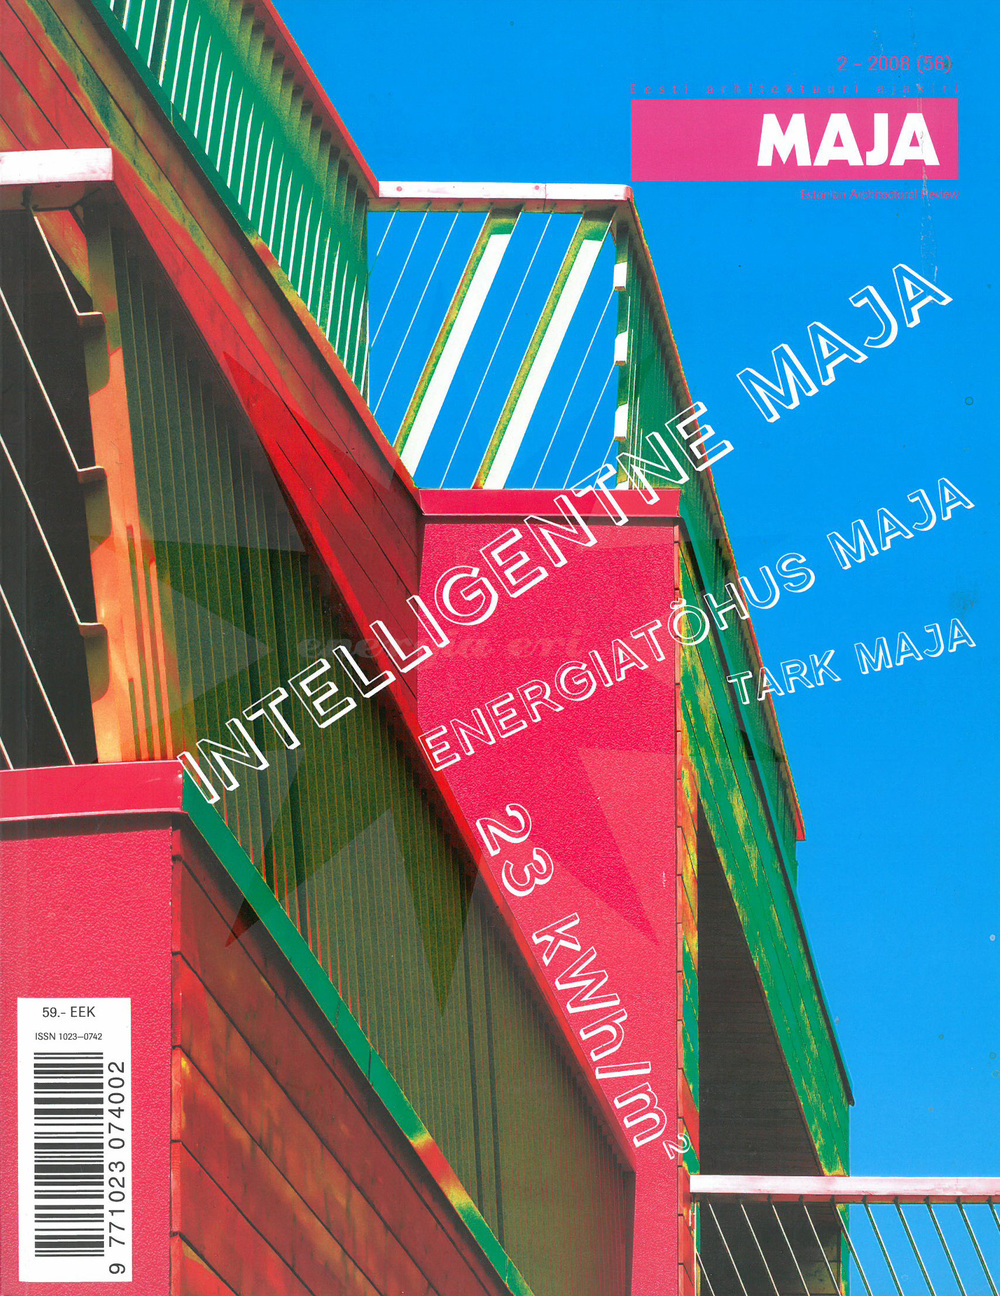 maja_cover.jpg